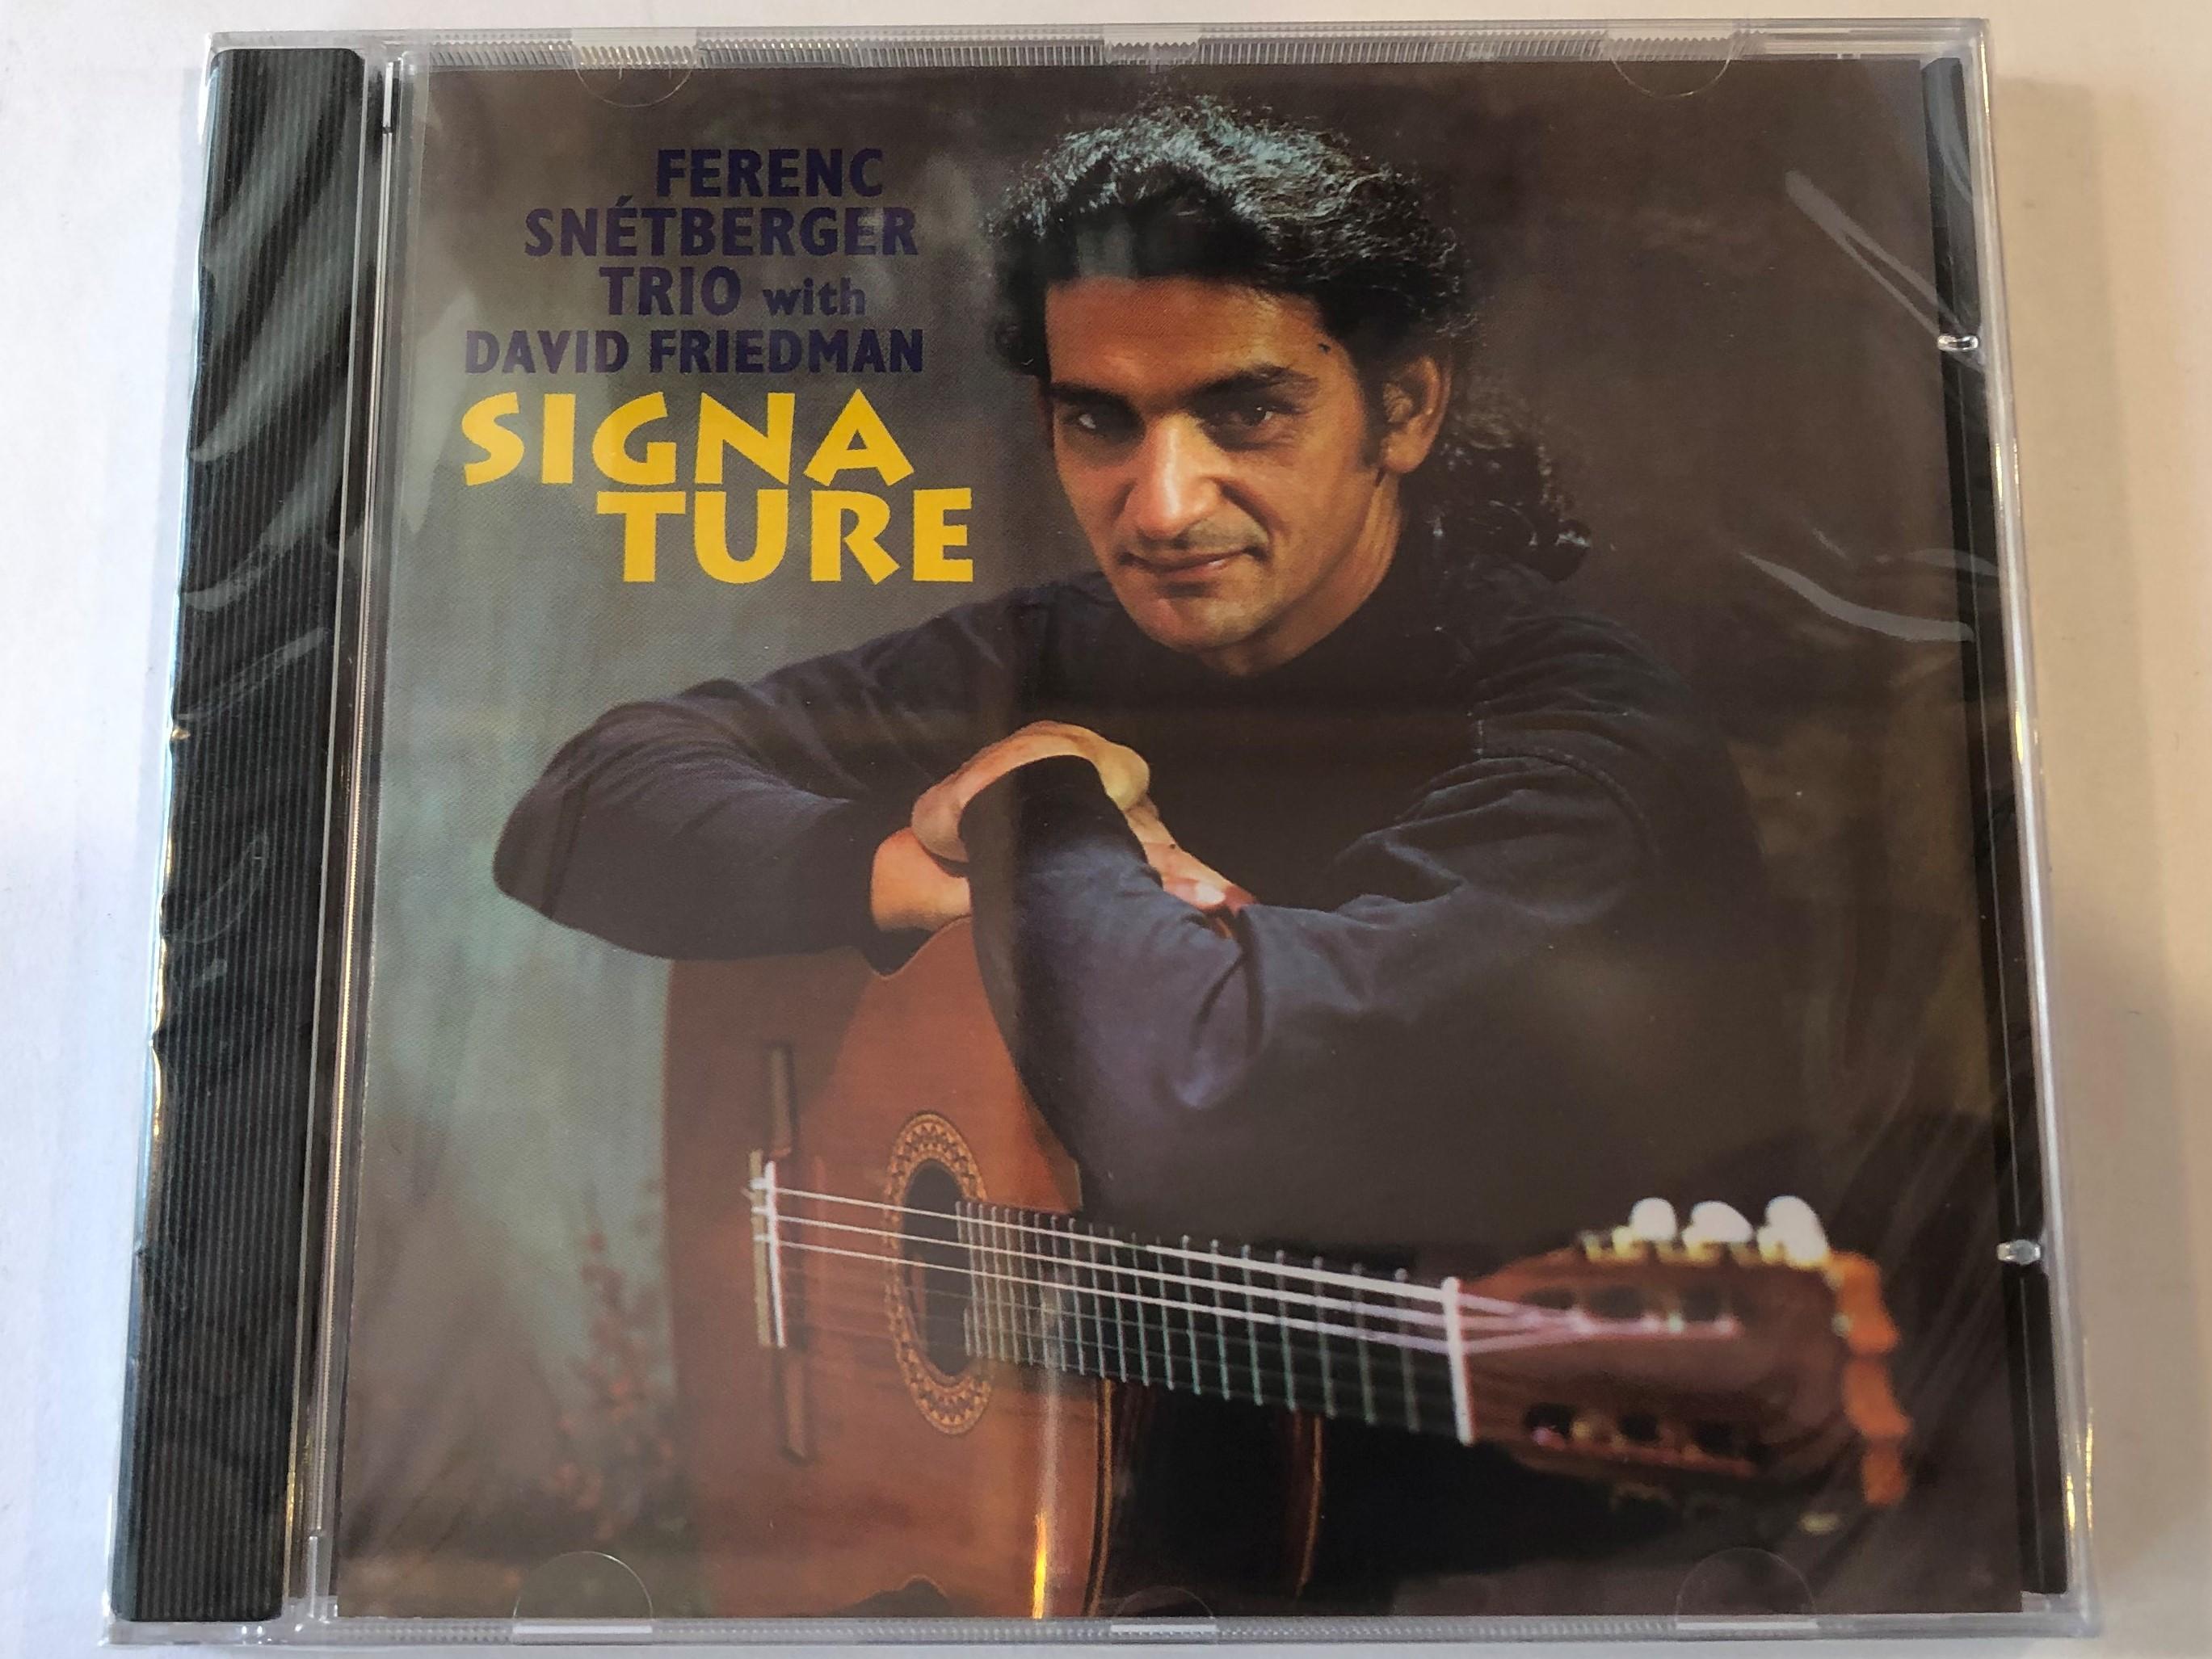 ferenc-sn-tberger-trio-with-david-friedman-signa-ture-enja-records-audio-cd-1995-enj-90172-1-.jpg